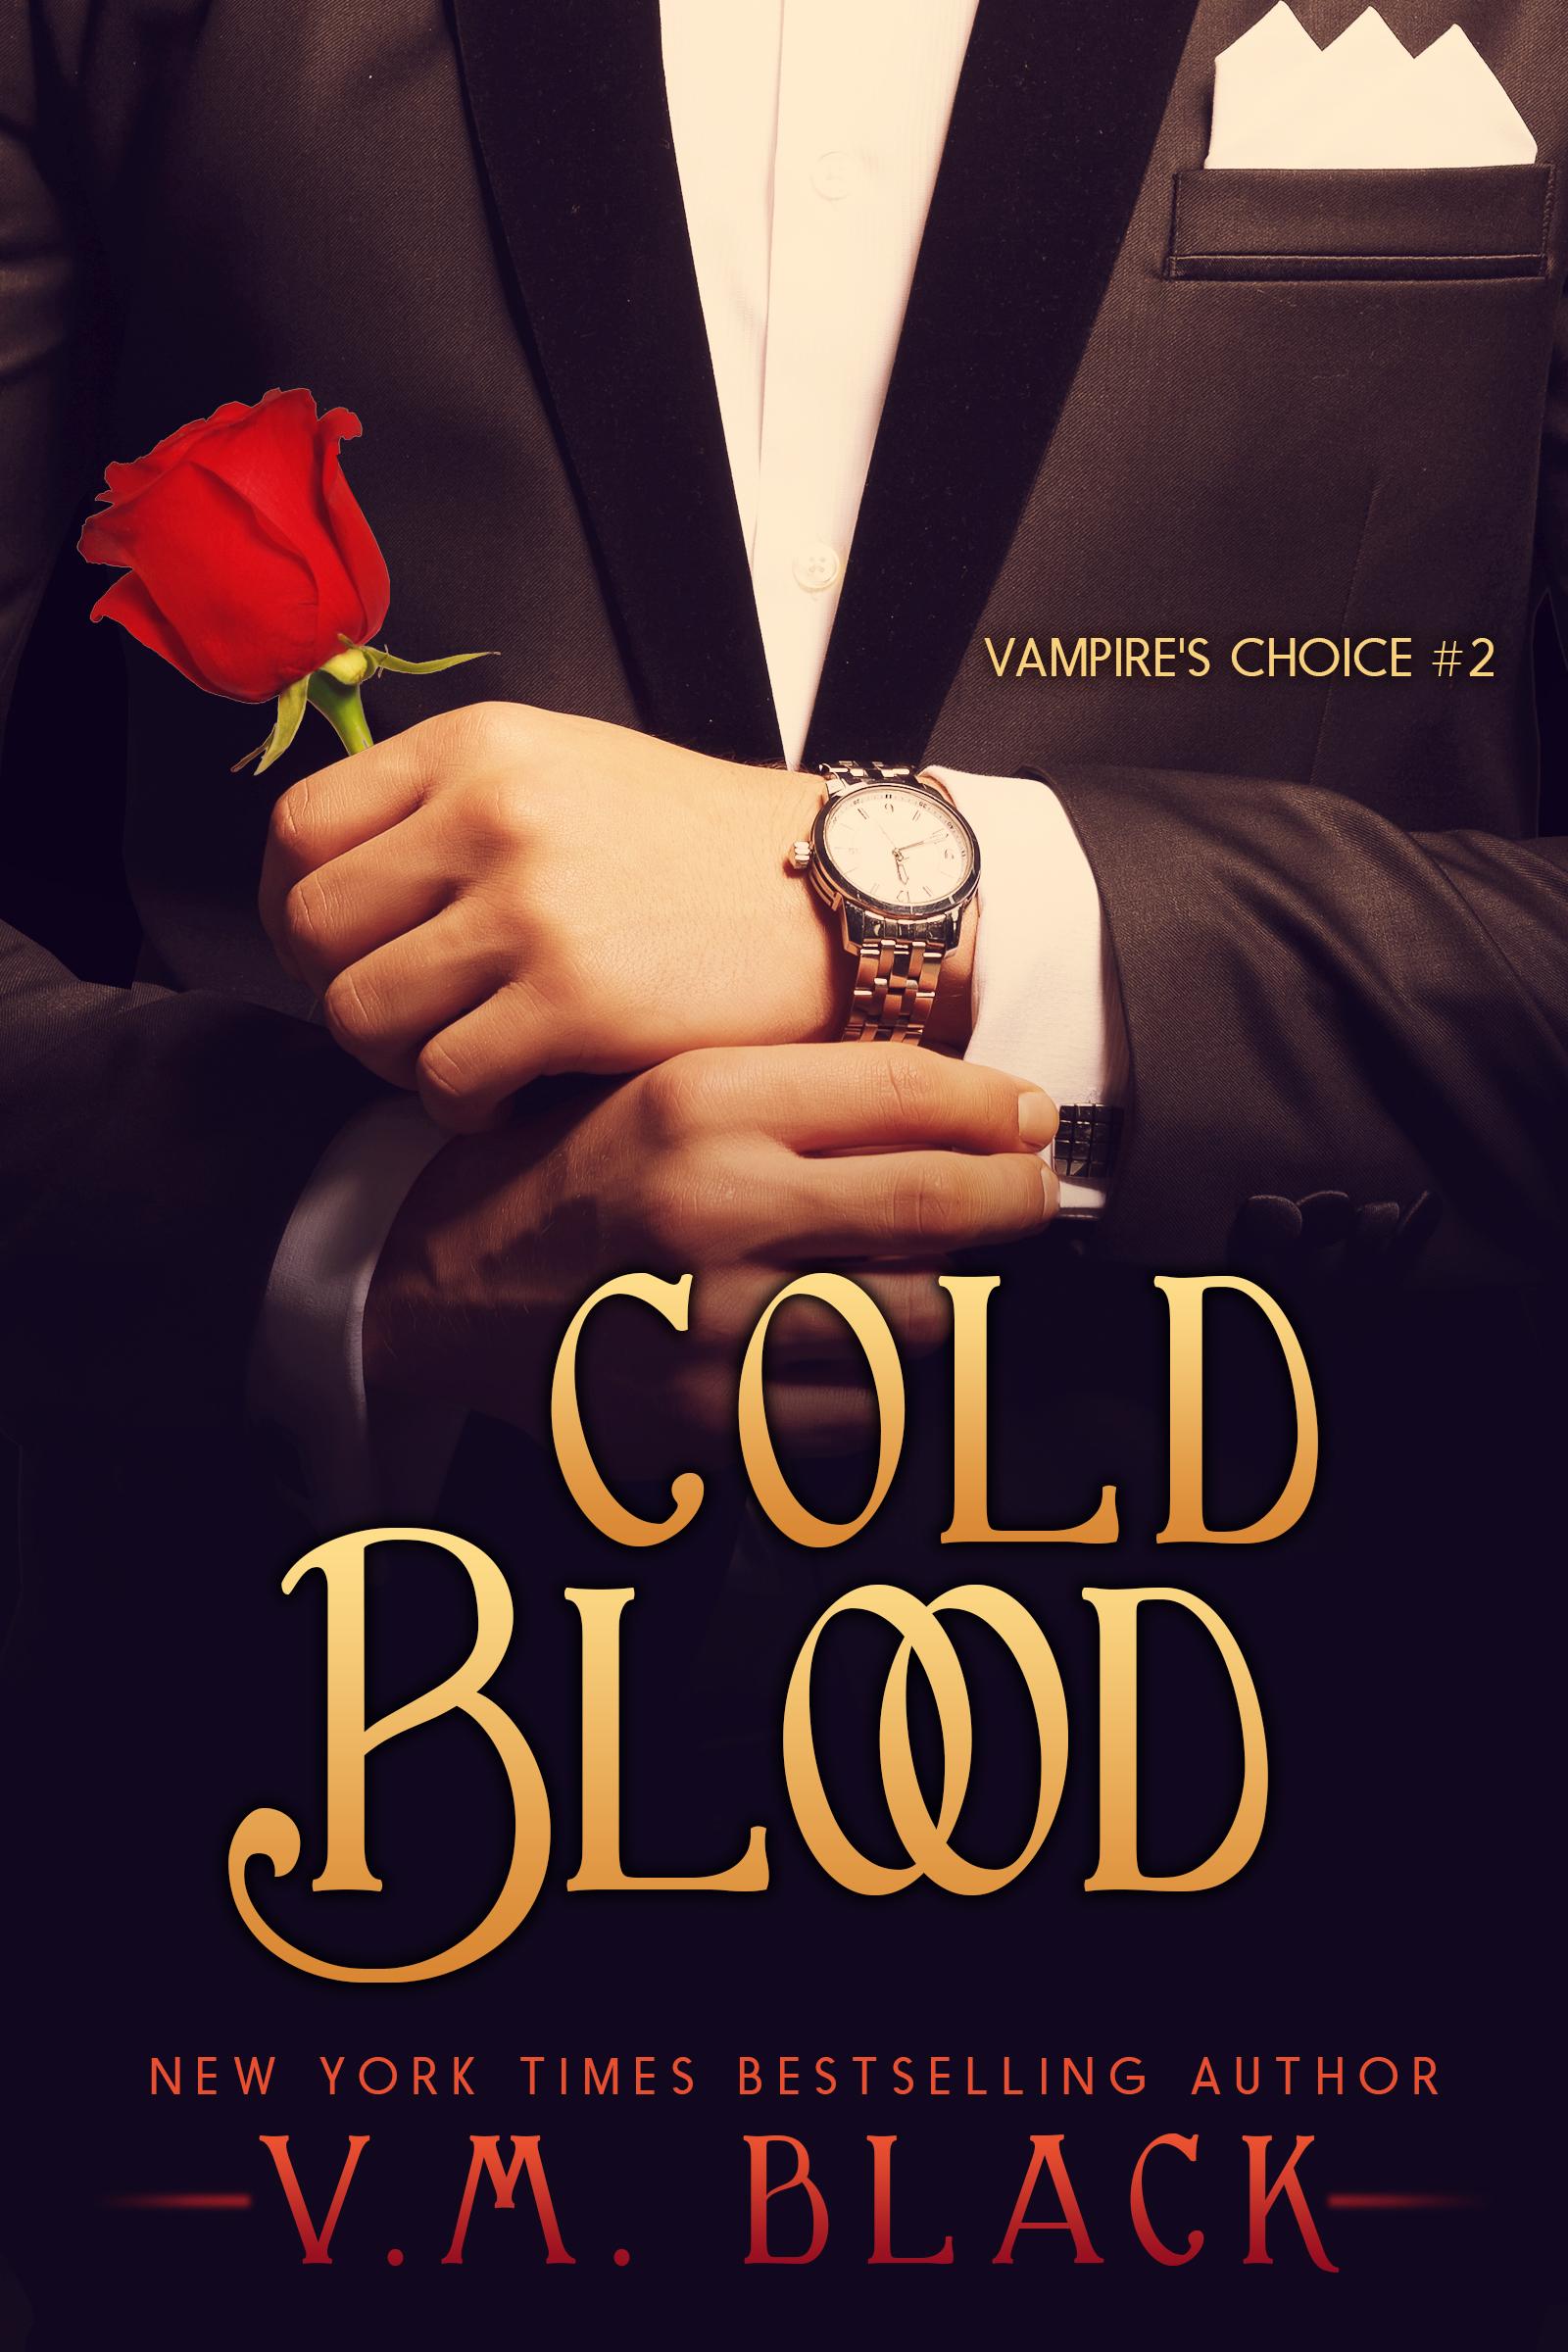 Cold Blood (Vampires Choice #2) V.M. Black